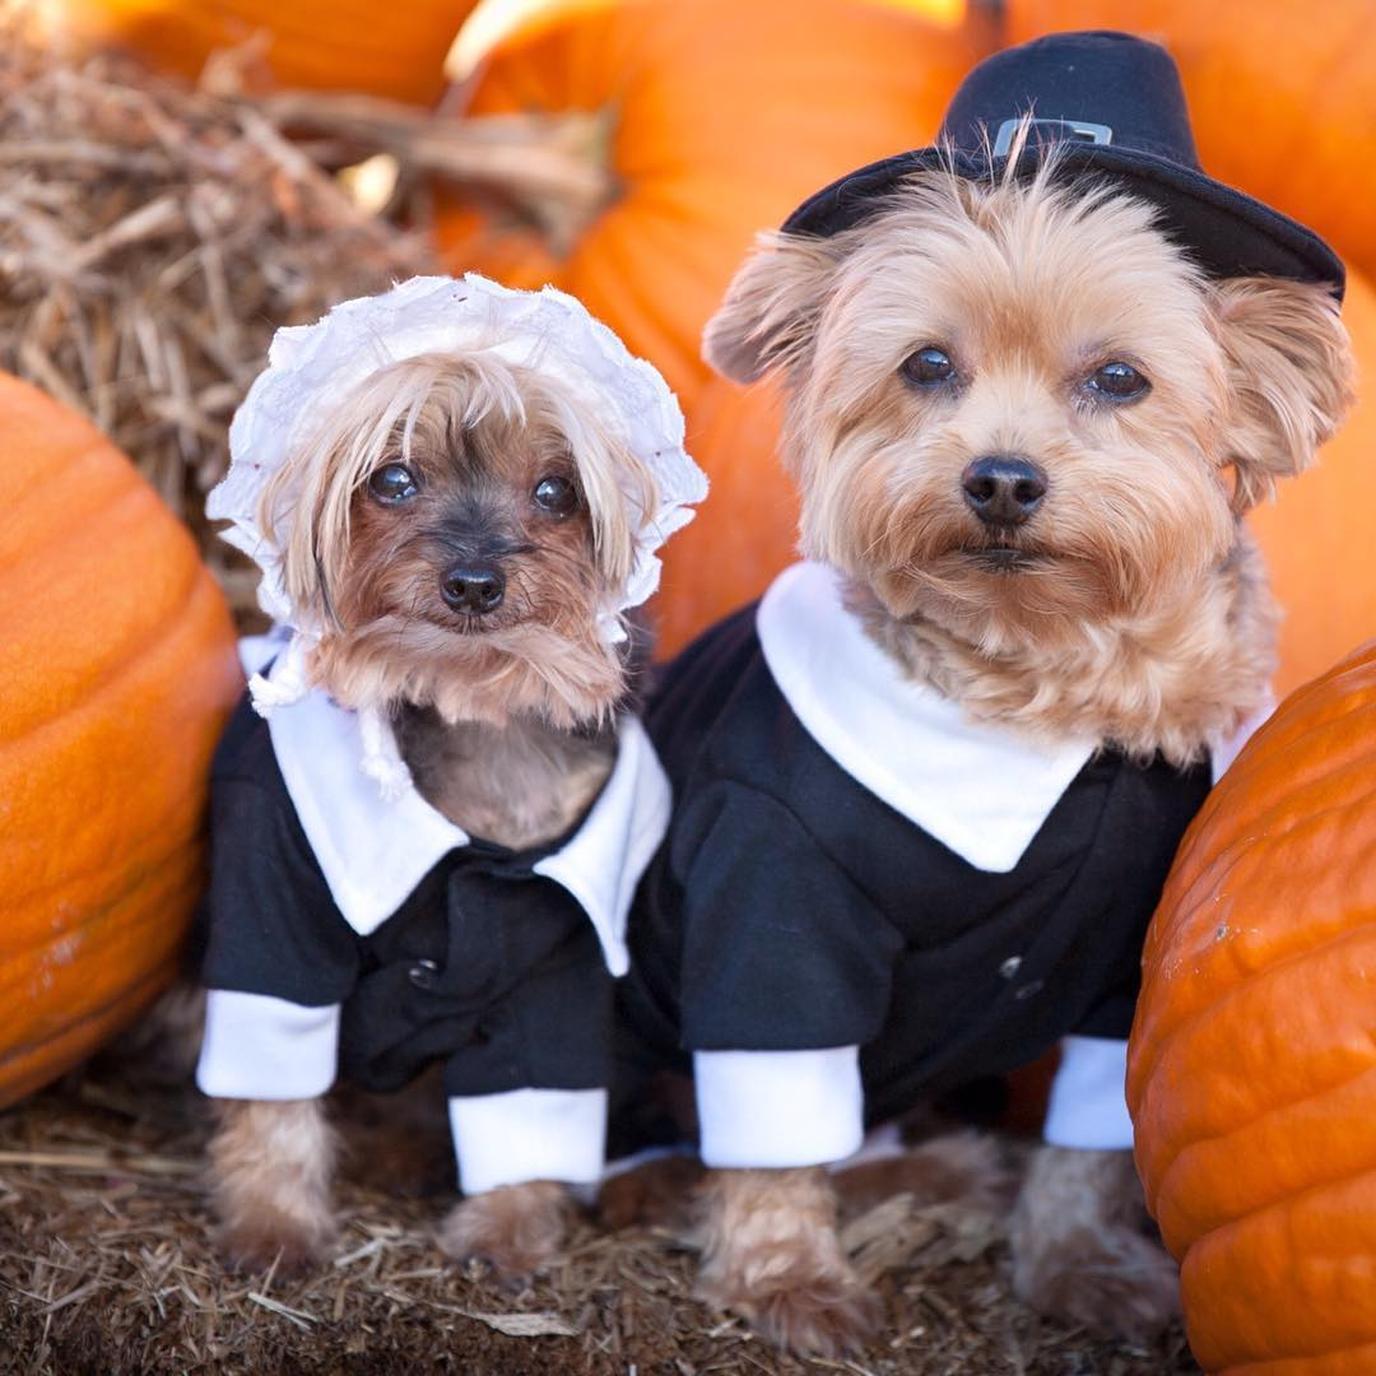 BringFido's Thanksgiving Pet Safety Tips